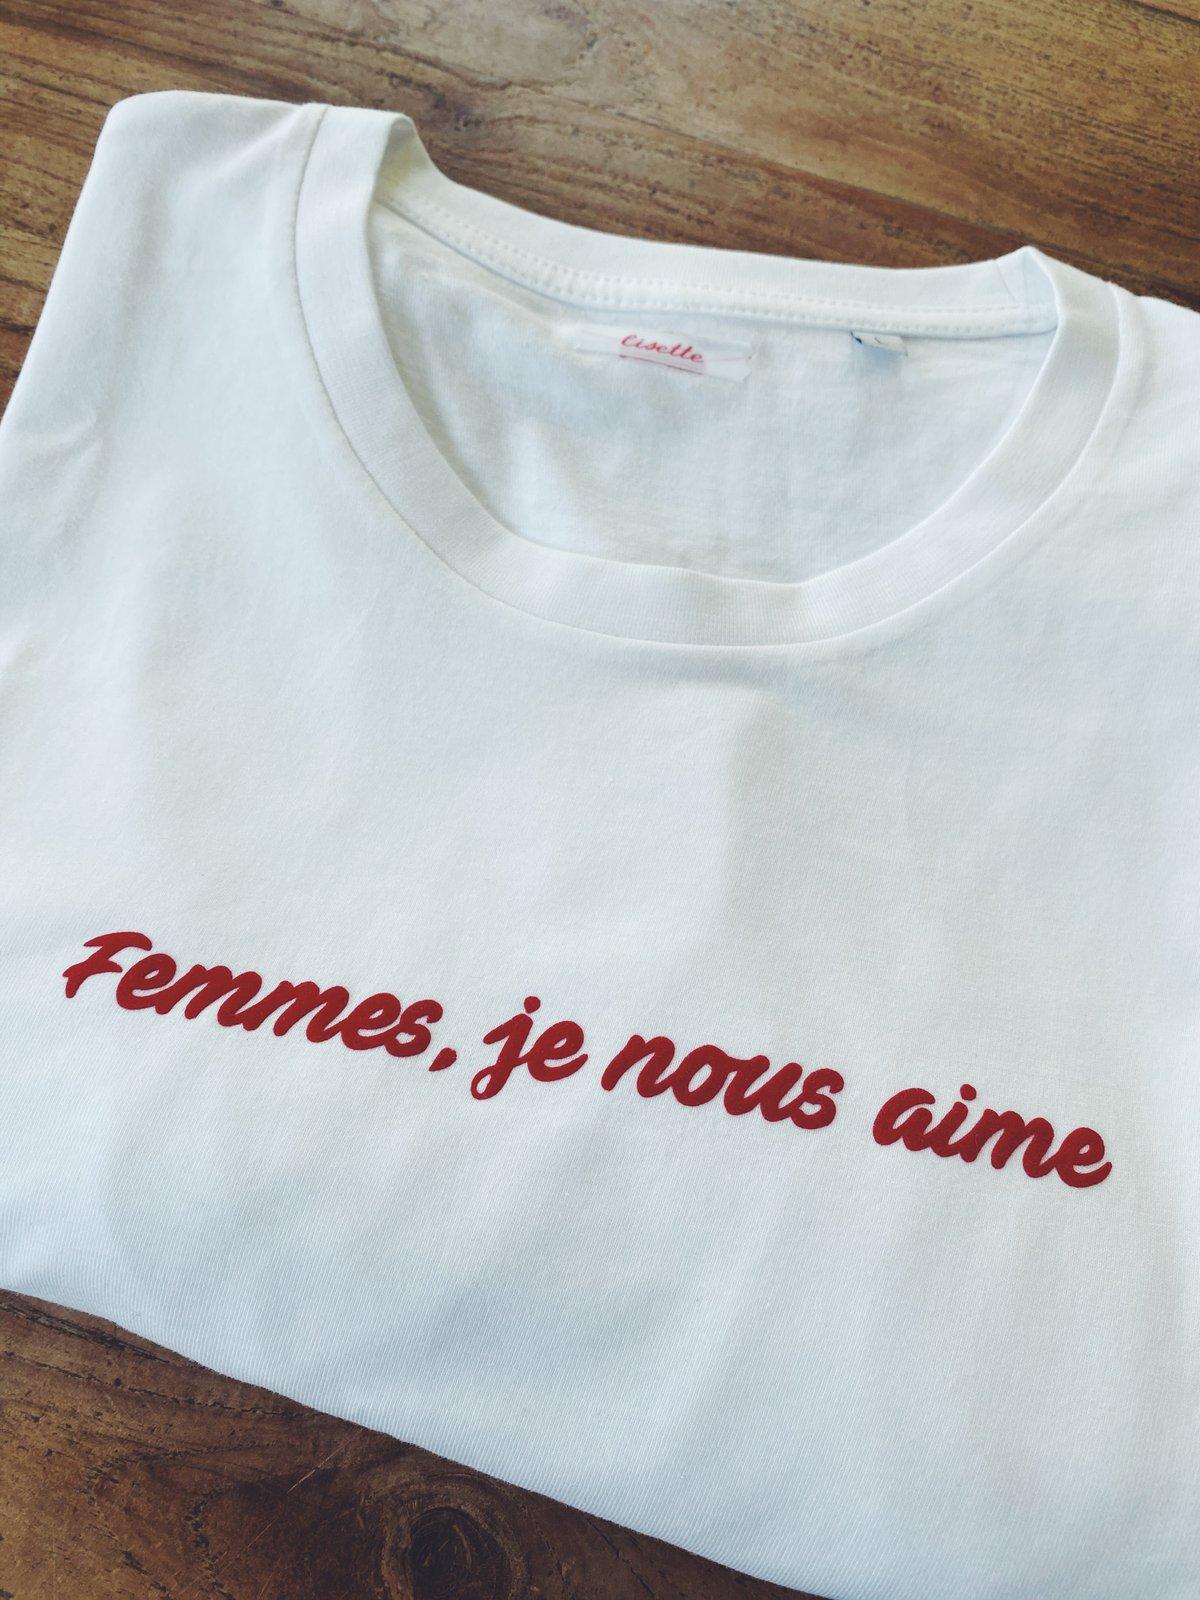 Image of Tee Shirt Femmes je nous aime 🥰